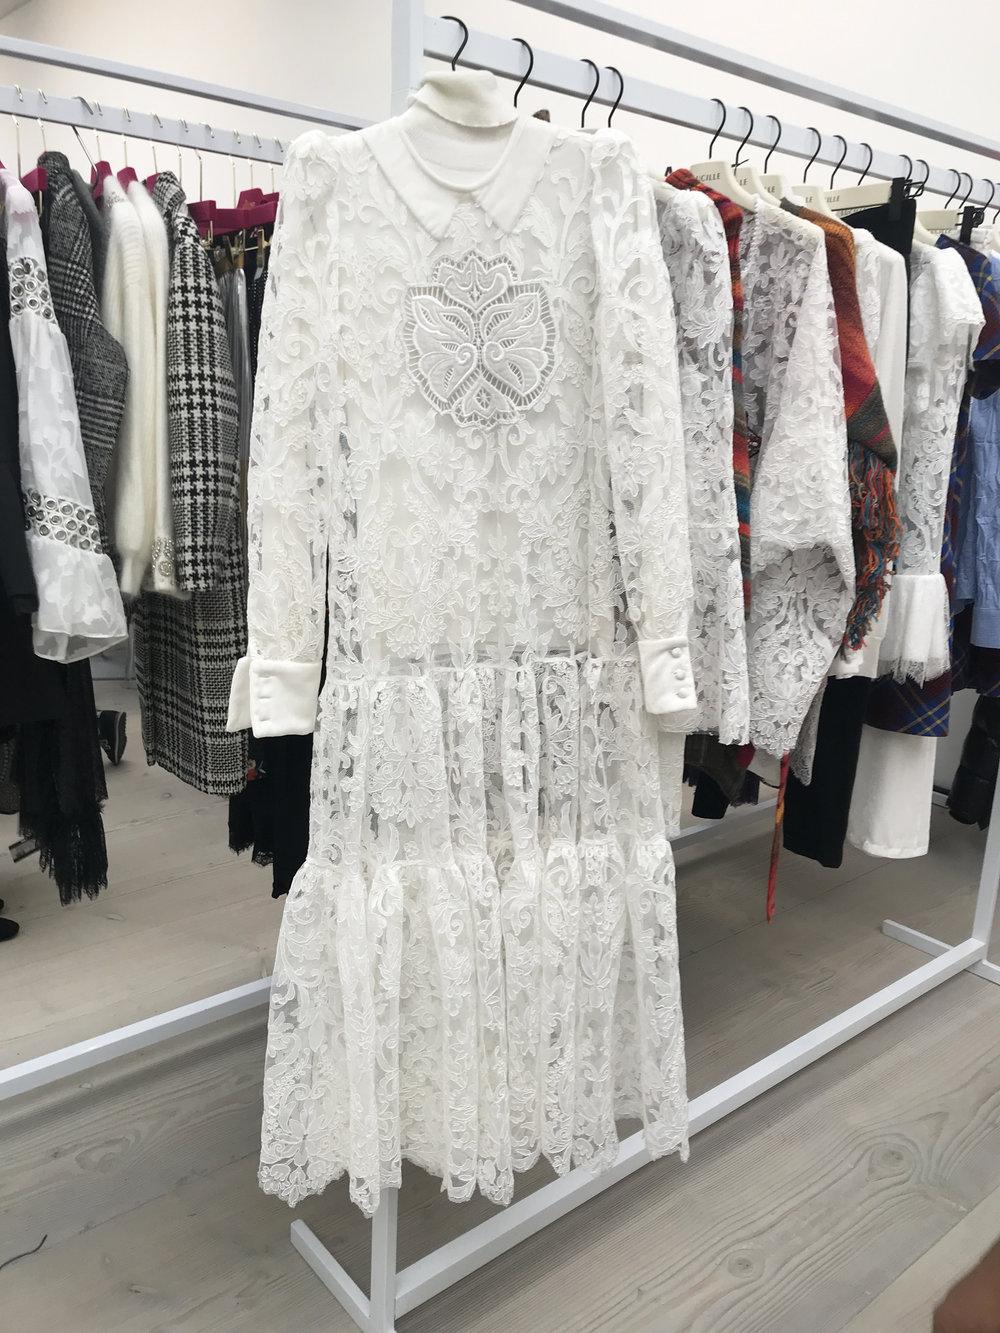 lucille dream dress.jpg